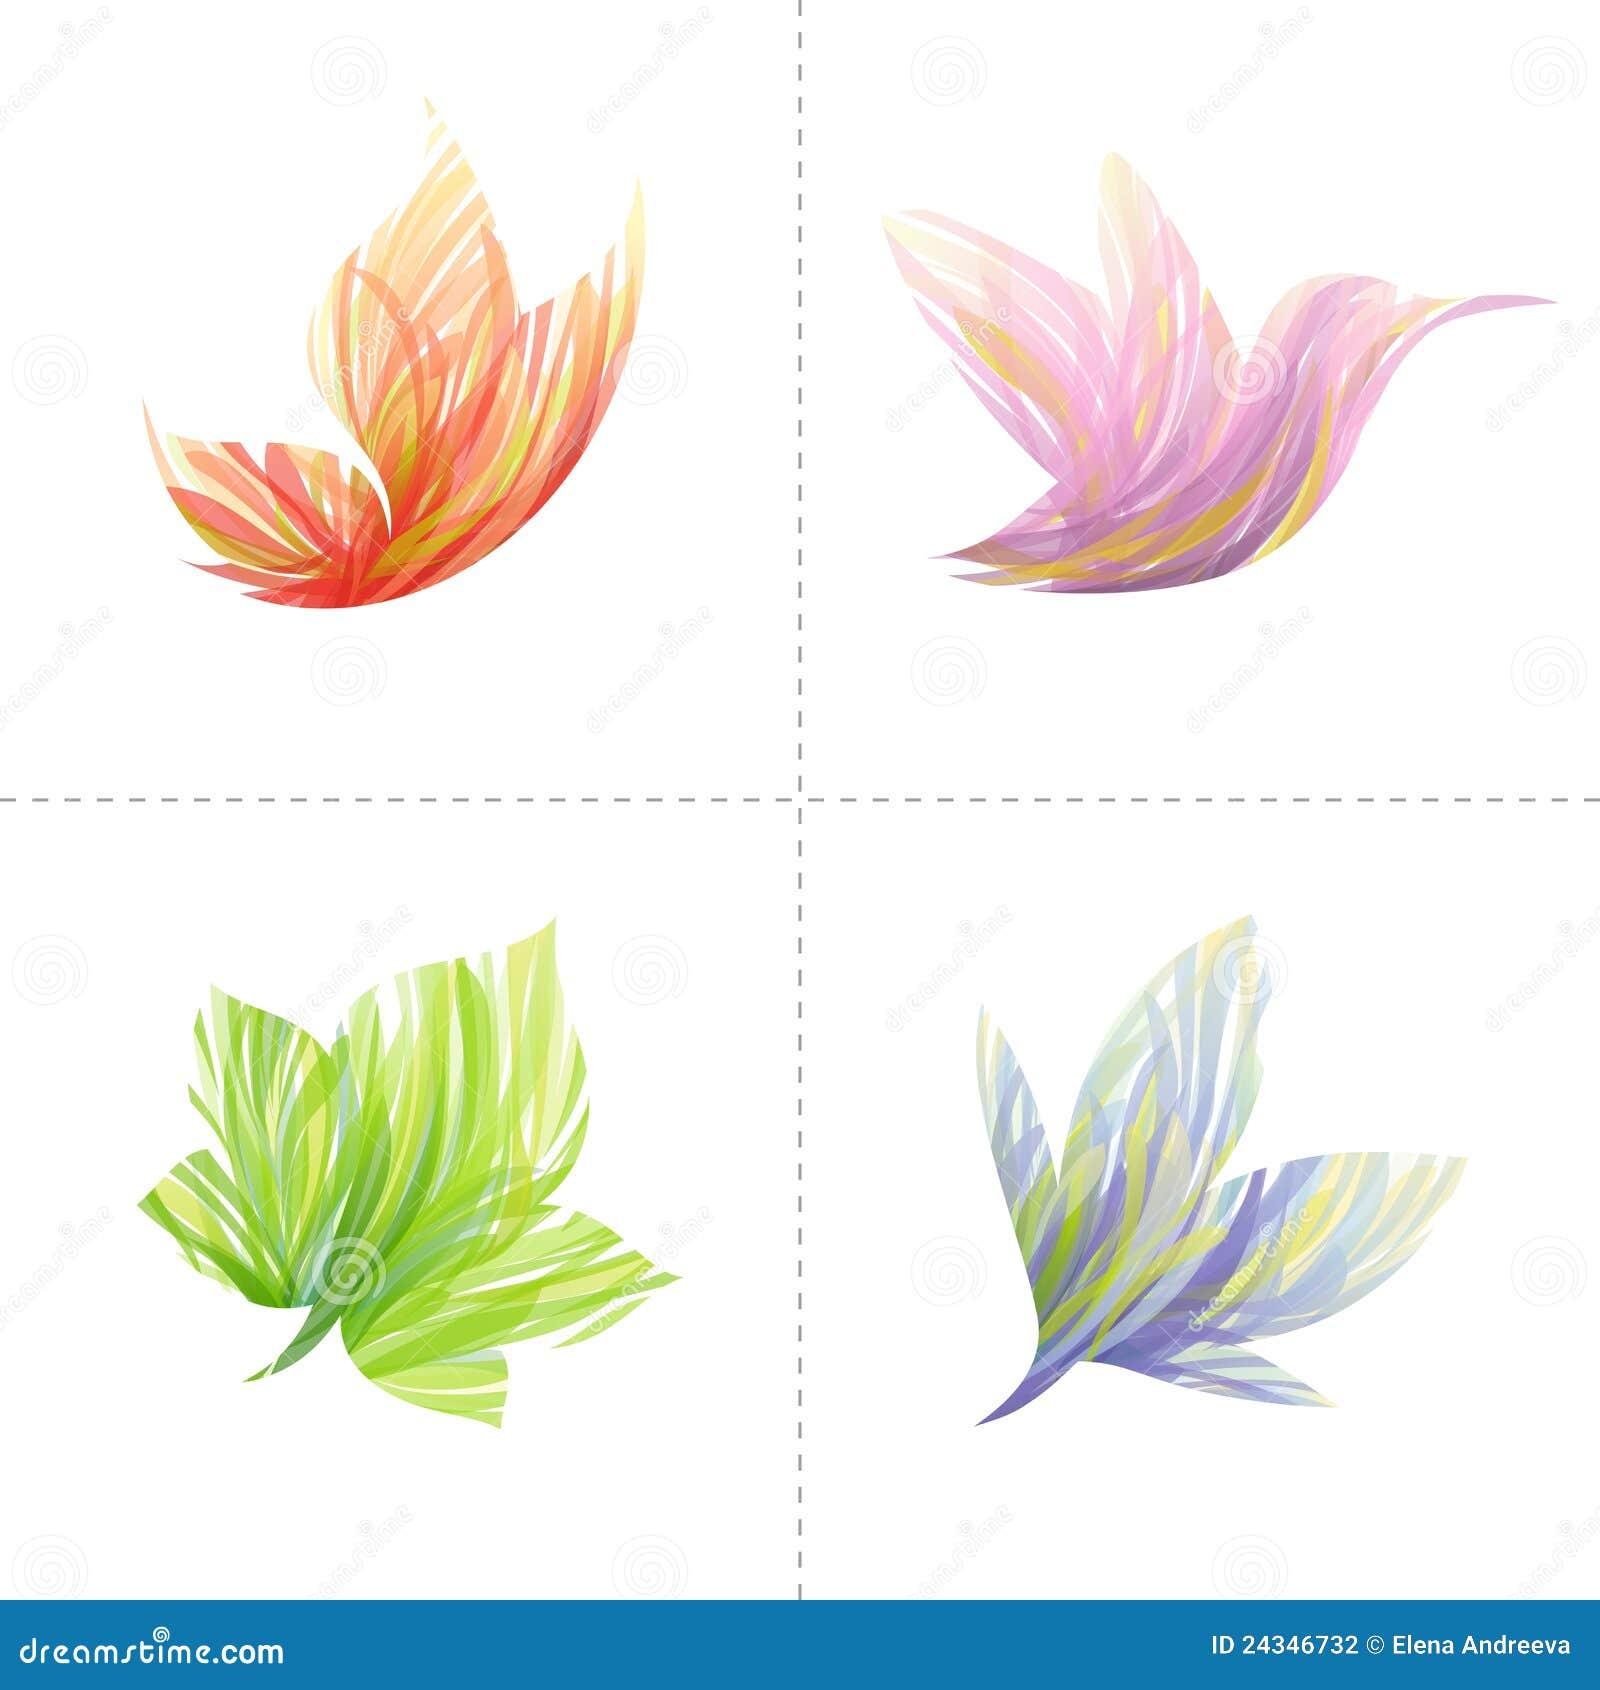 Elementos do projeto: borboleta, colibri, folha, flo